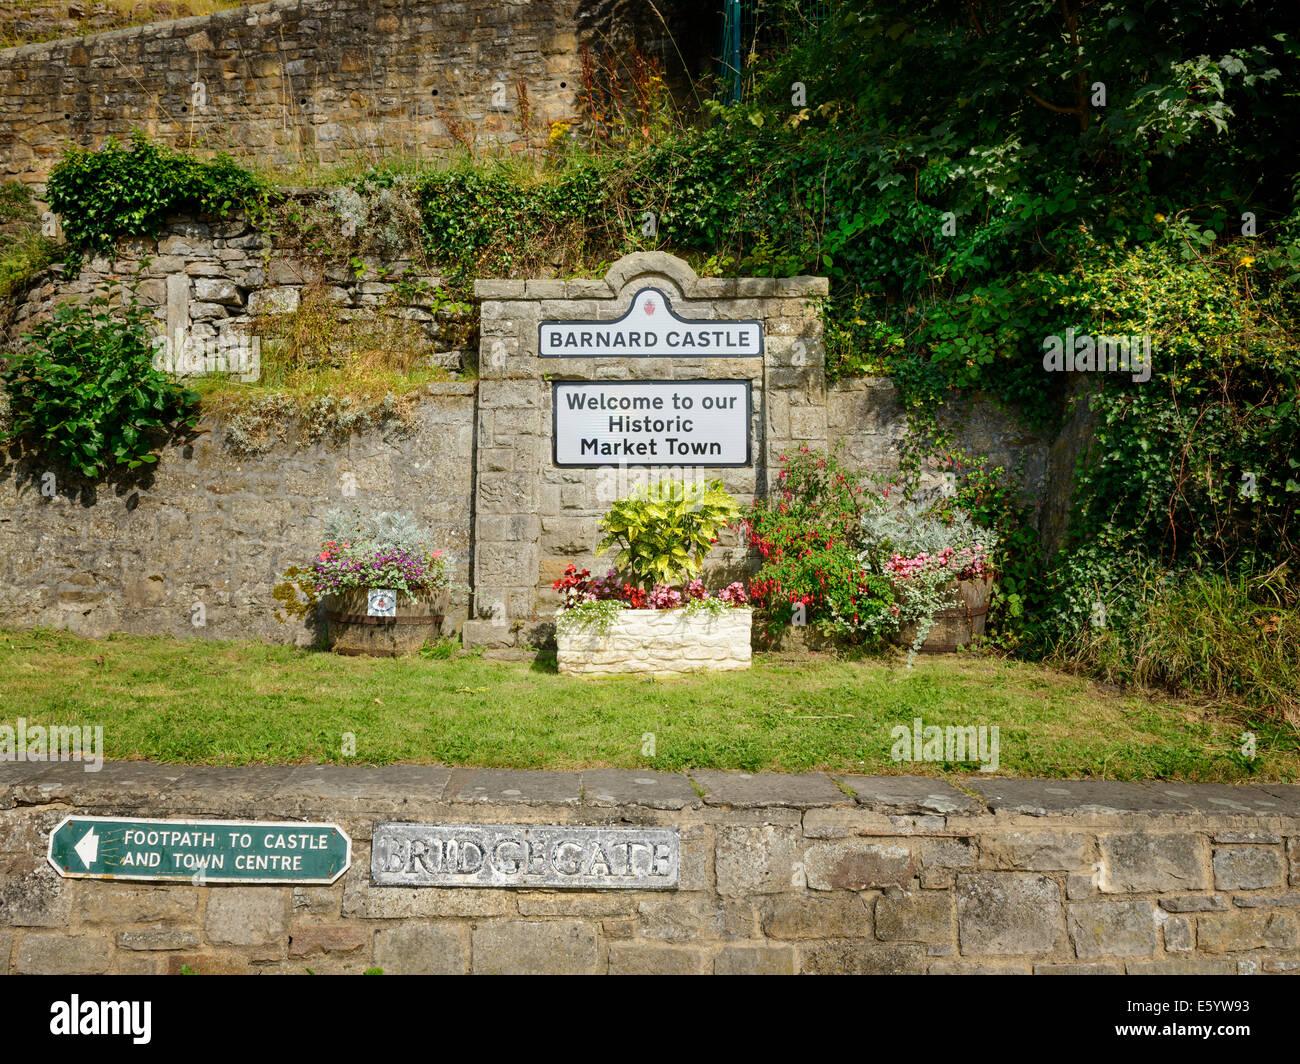 Barnard Castle, Teesdale, County Durham - Stock Image